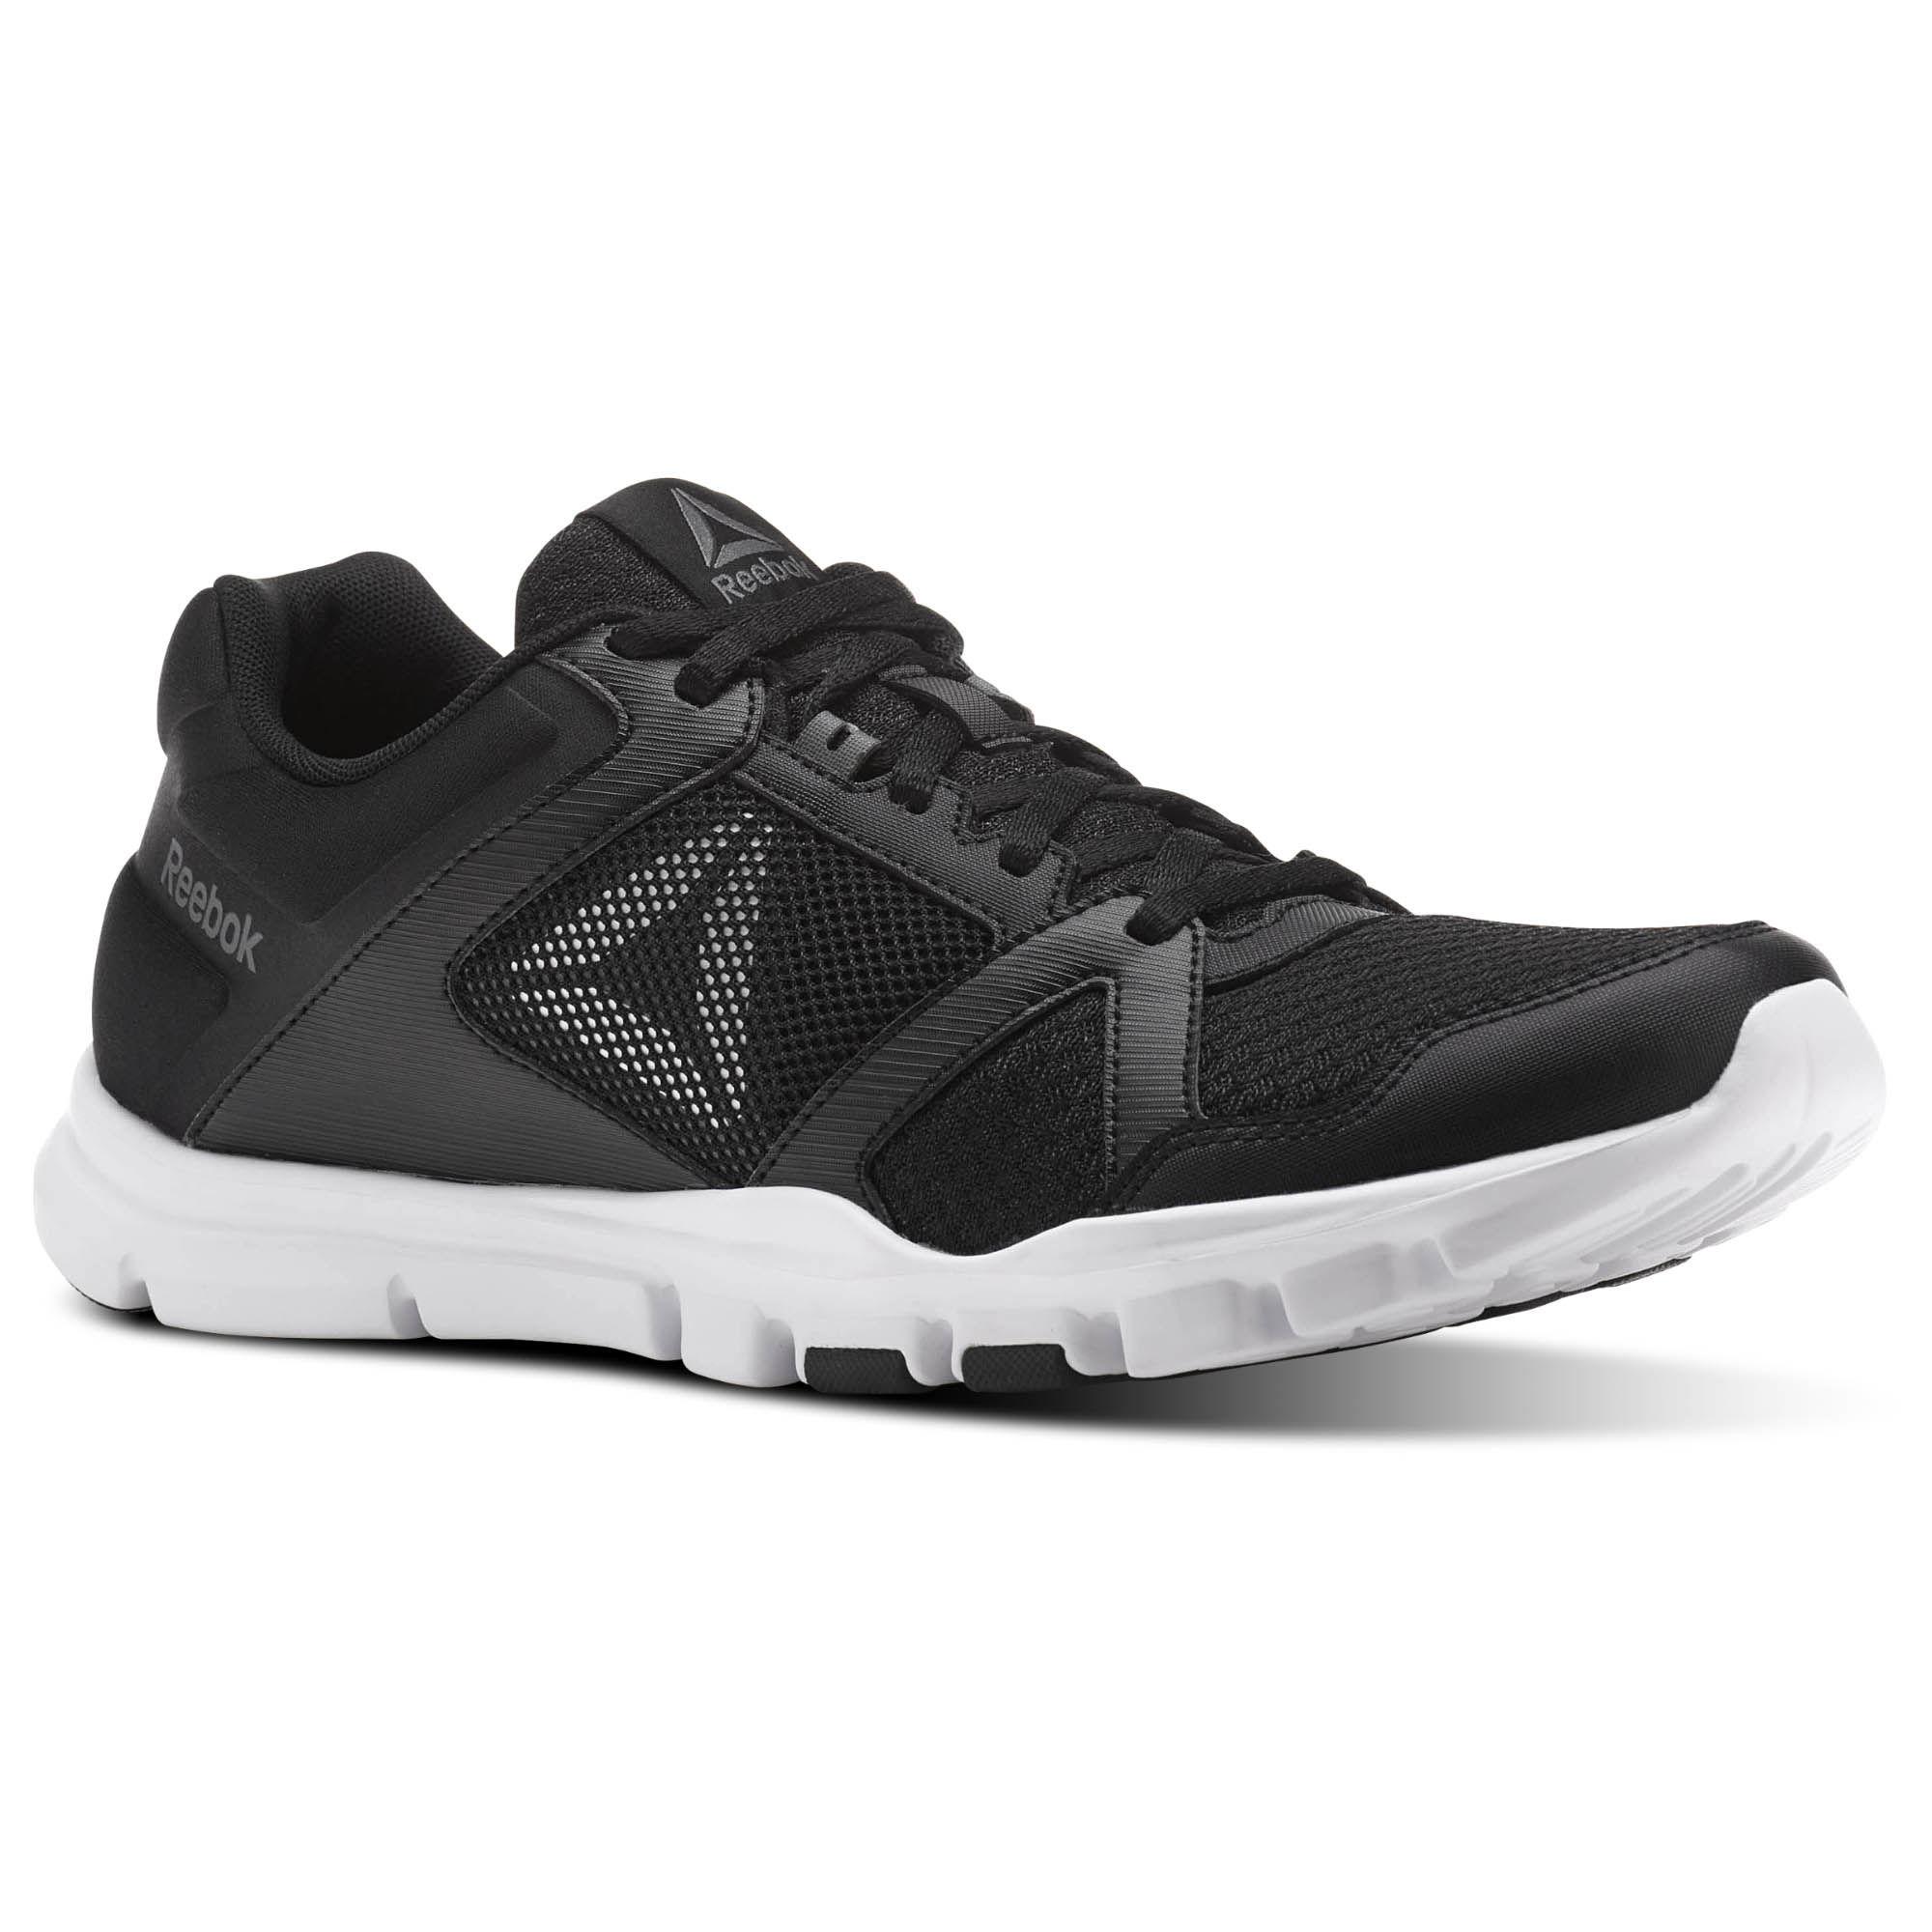 YOURFLEX TRAIN 10 MT - Sports shoes - black Cheap Outlet DBZFsqMFx